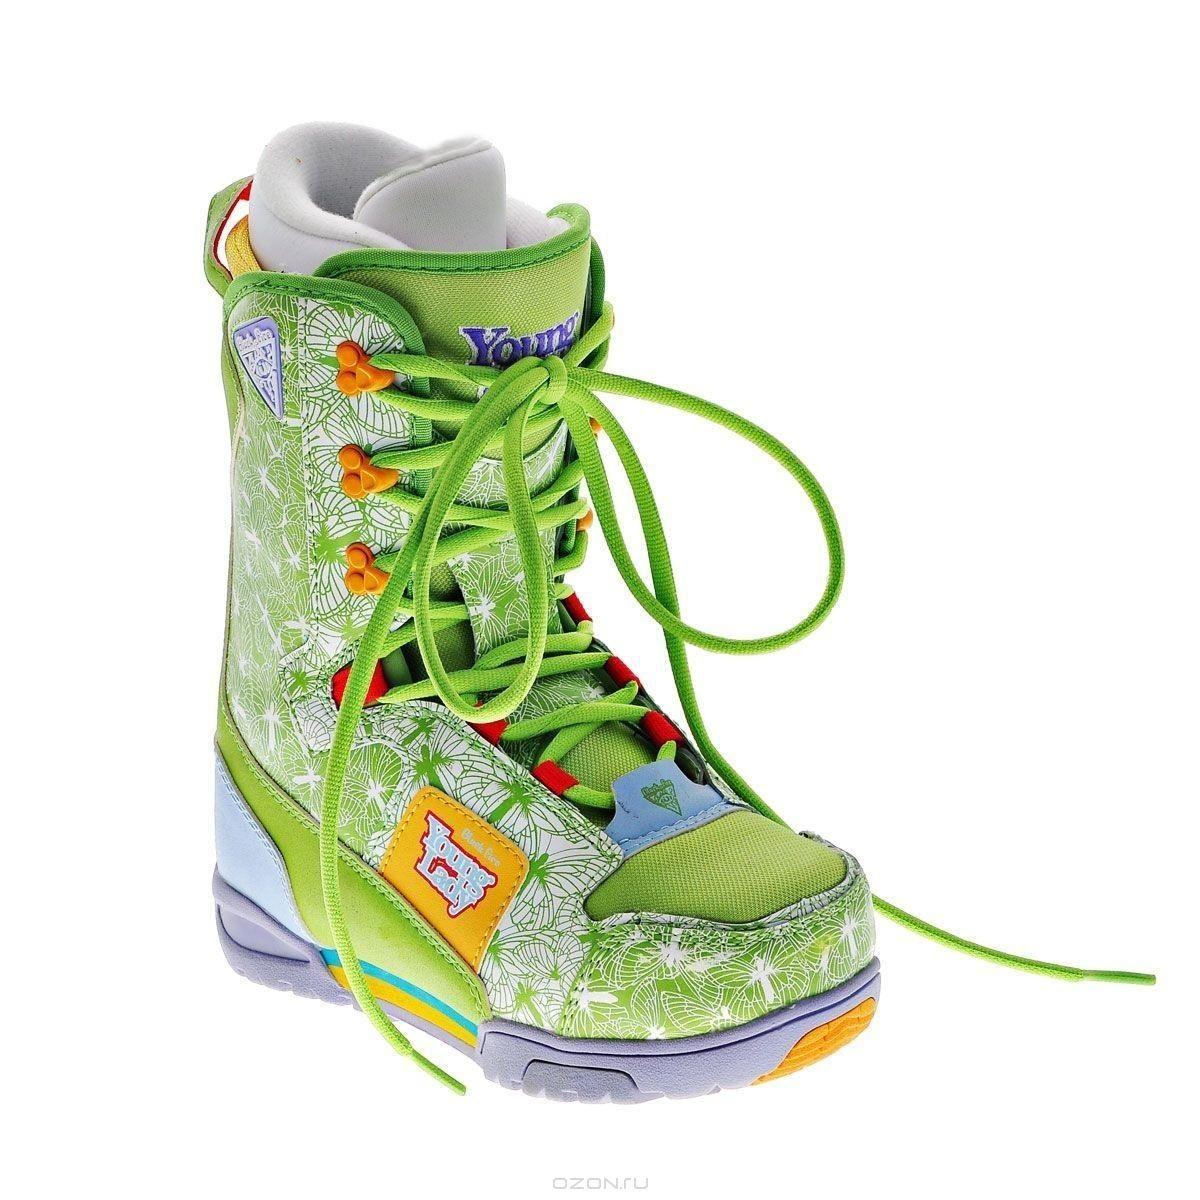 Ботинки для сноуборда Black Fire Junior Girl, зеленый. Размер 36